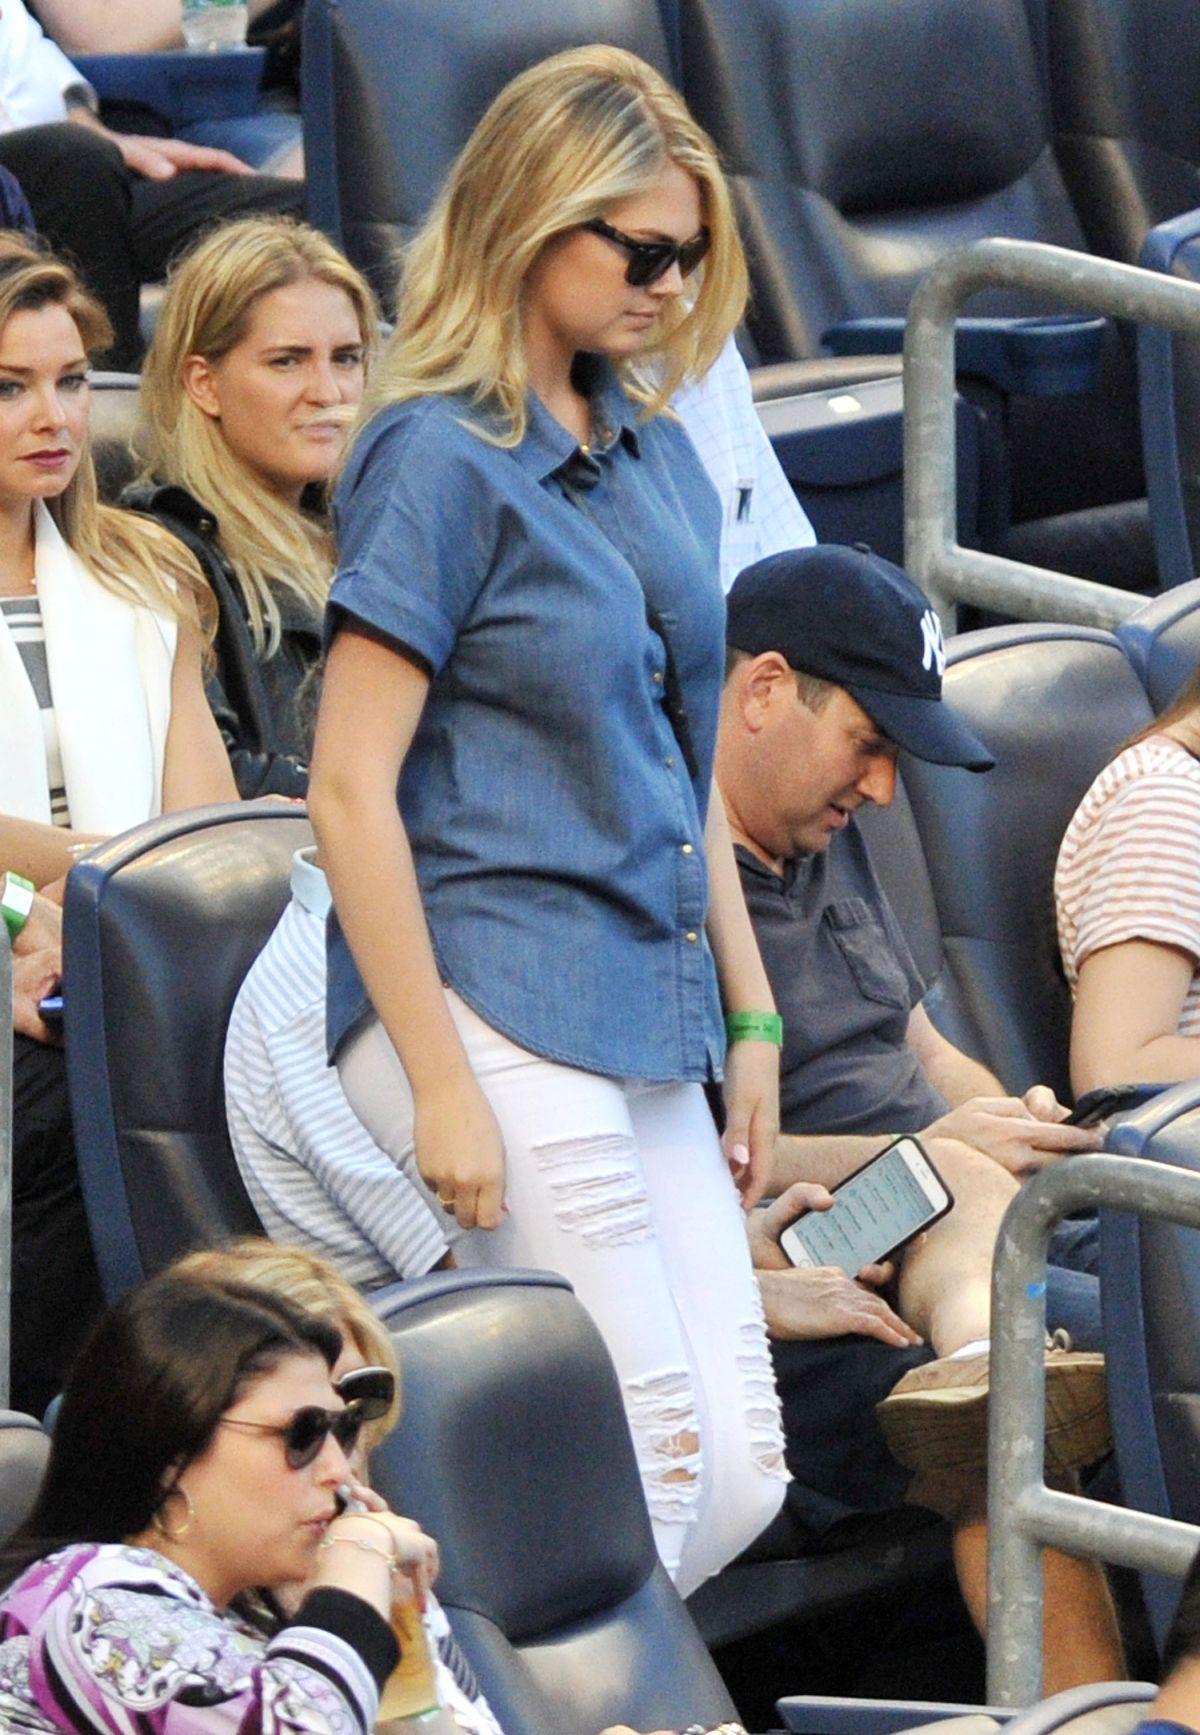 KATE UPTON at New York Yankees vs. Detroit Tigers Game in New York 06/19/2015